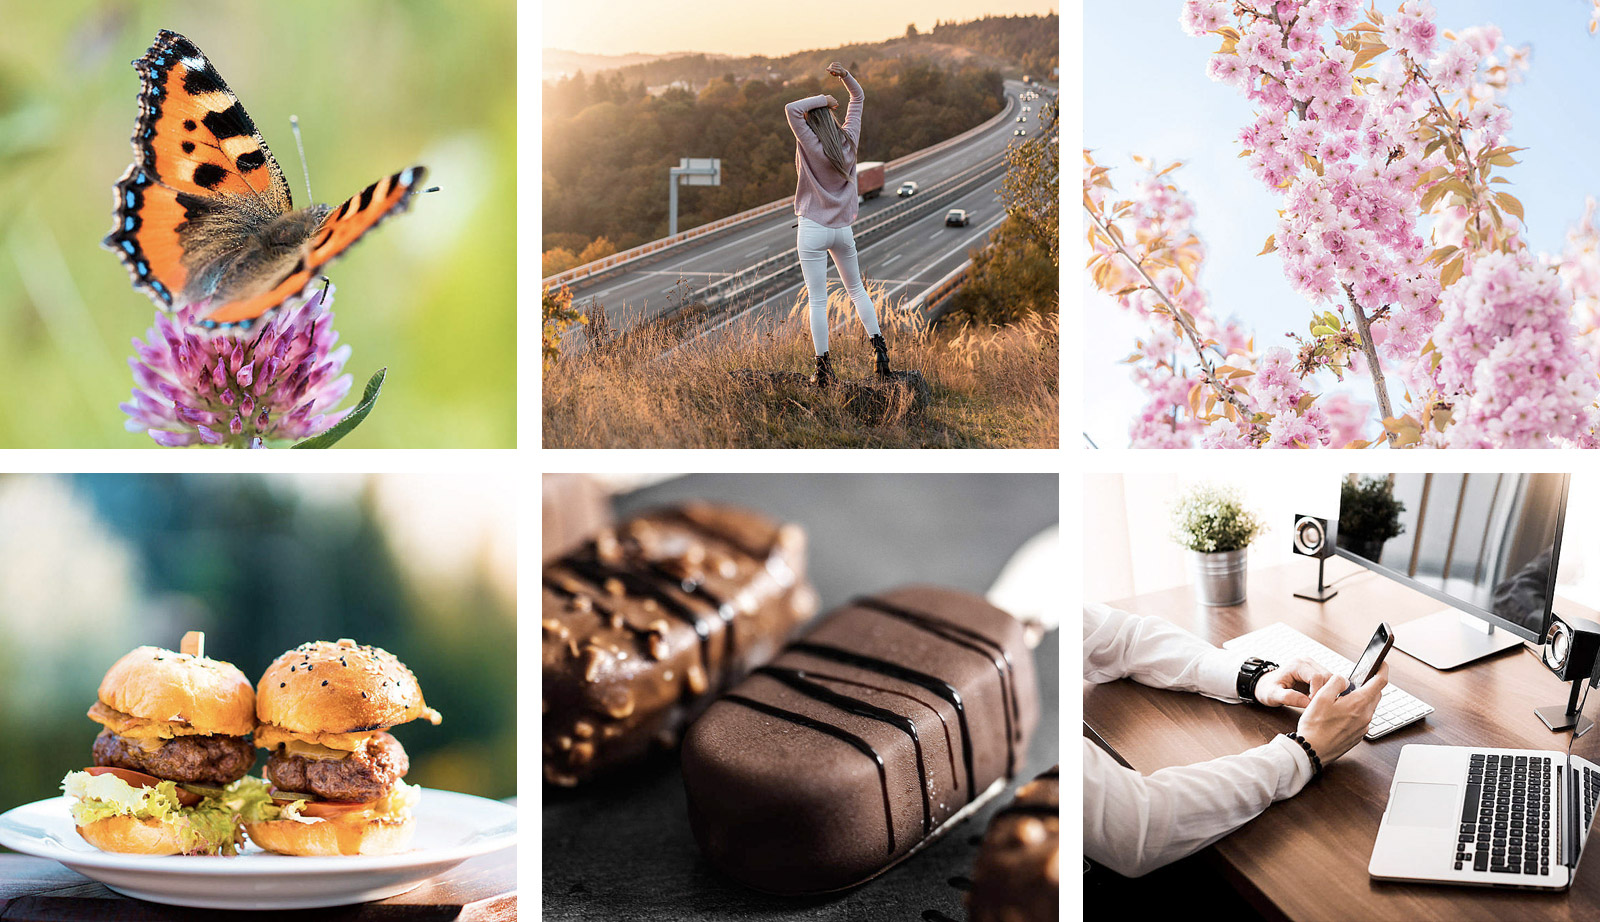 Exemplarische picjumbo.com-Bilder. Freie hochwertige Fotos.